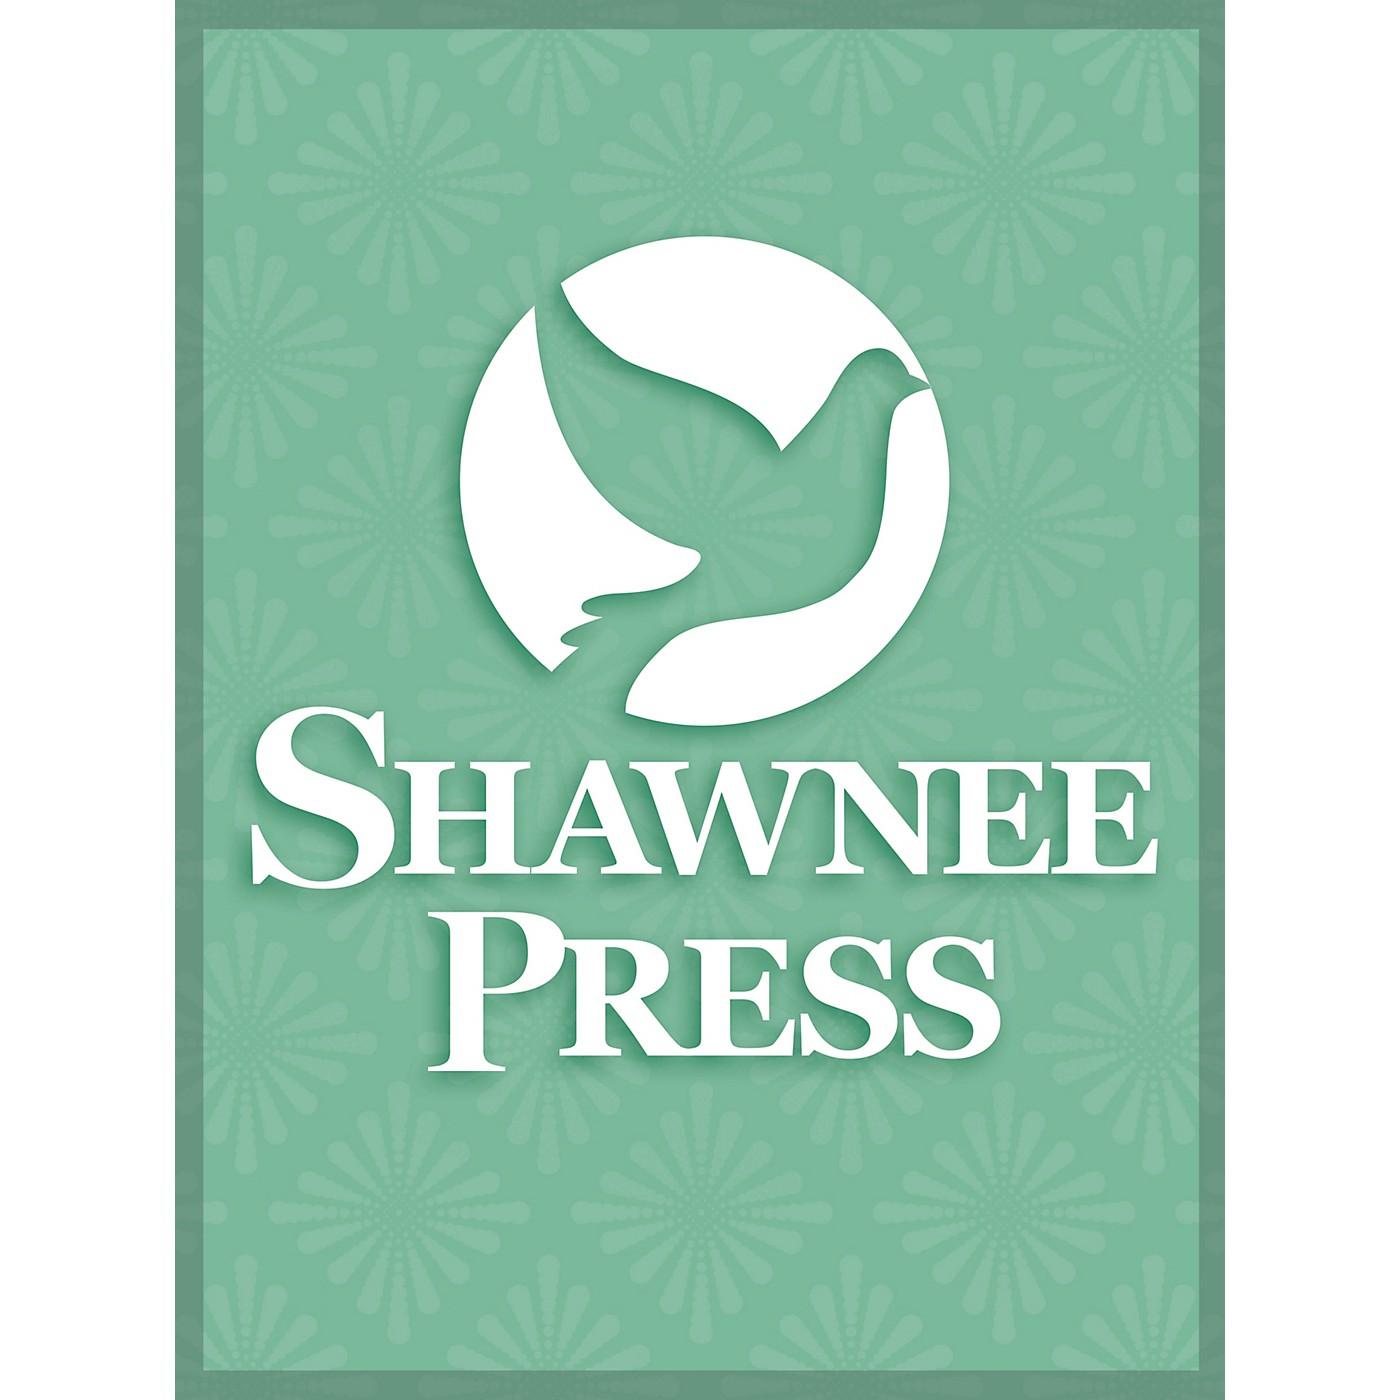 Shawnee Press Hymns for All (C Inst. Book) Shawnee Press Series Arranged by Schaeffer thumbnail